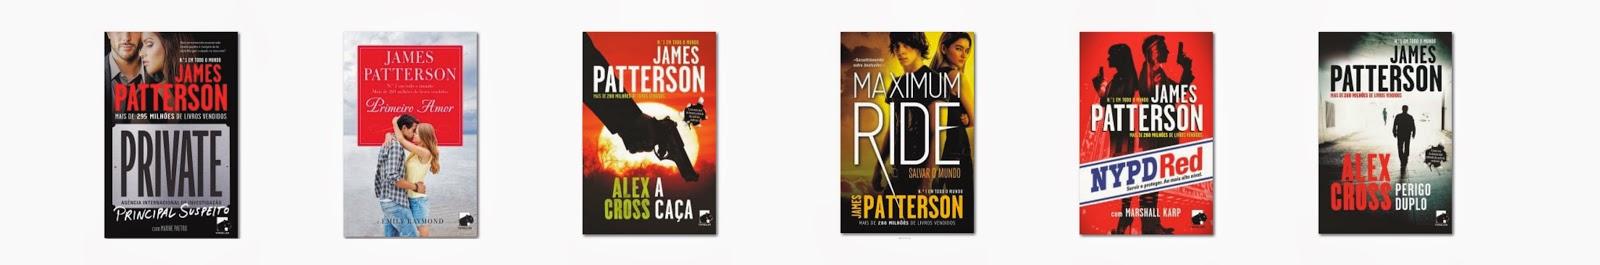 http://www.topseller.pt/livros/nypd-red-a-margem-da-lei